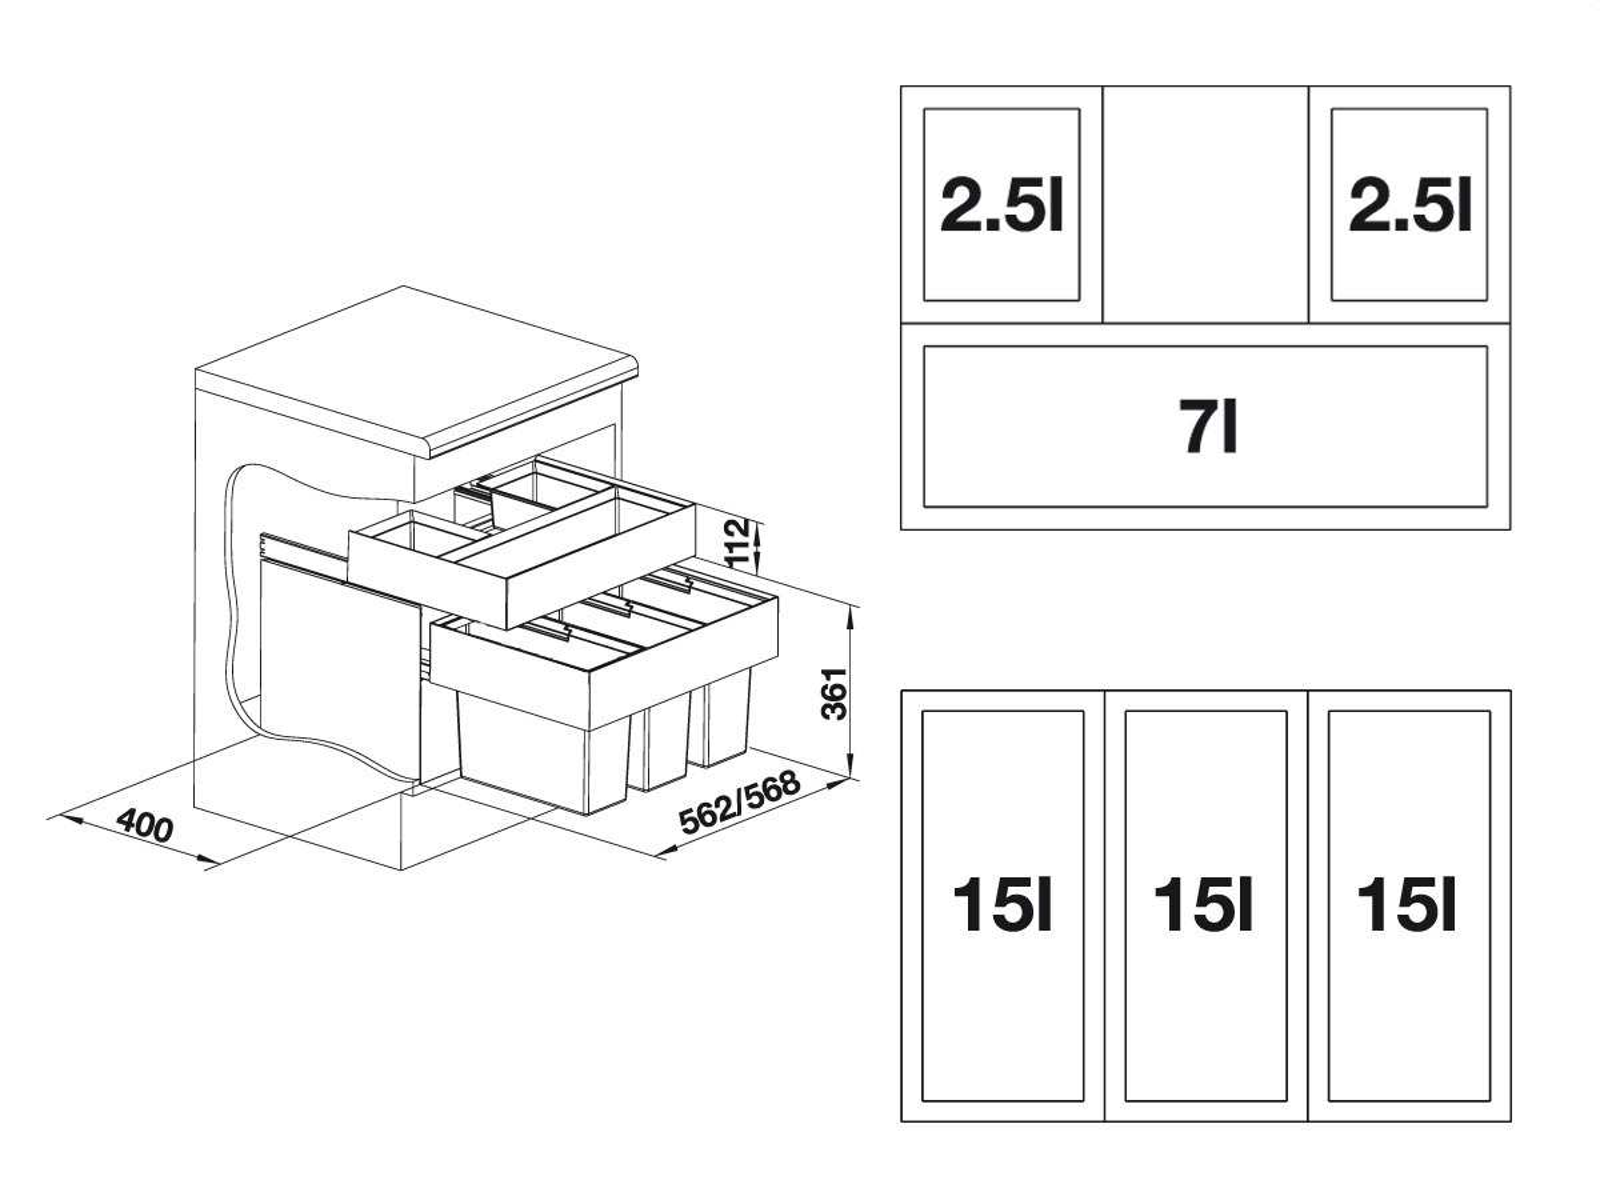 blanco select 60 3 orga einbau abfallsammler kunststoffeimer schublade m lleimer ebay. Black Bedroom Furniture Sets. Home Design Ideas